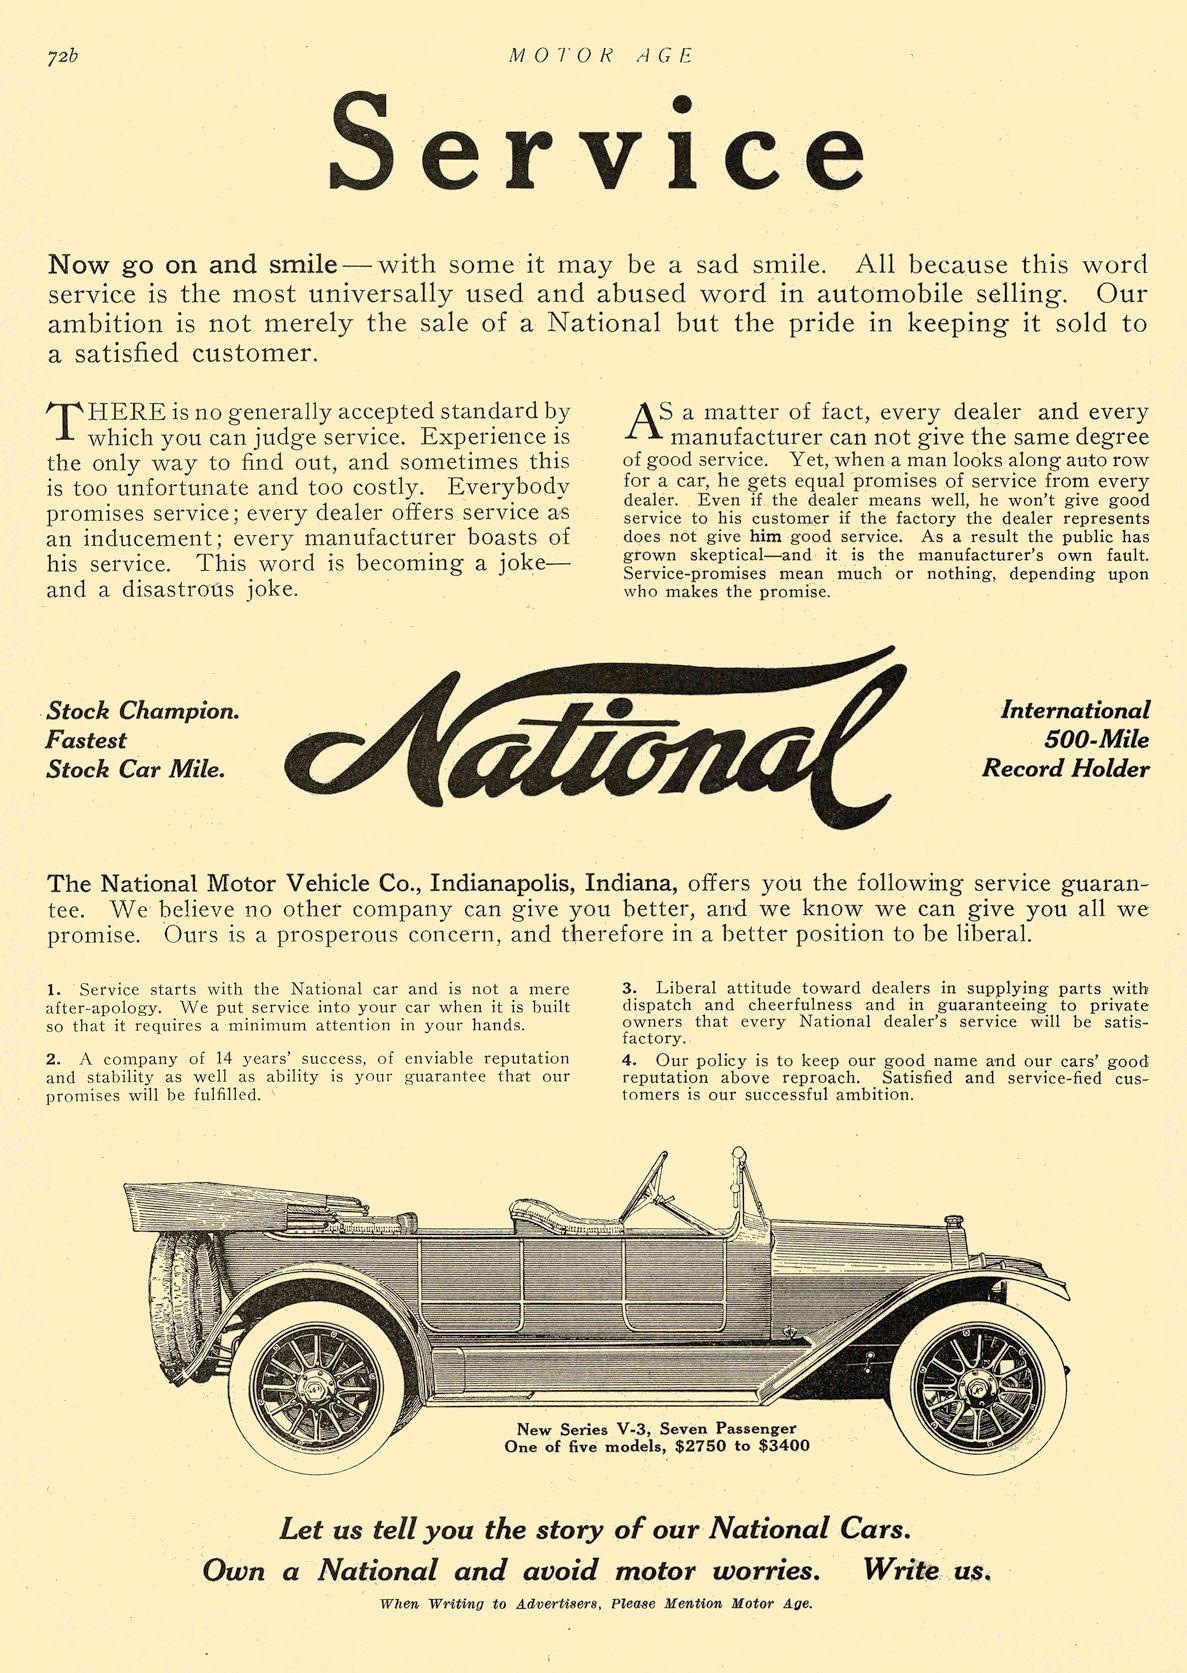 1913 11 6 NATIONAL National Service National Motor Vehicle Company Indianapolis, IND MOTOR AGE November 6, 1913 8.5″x12″ page 72b